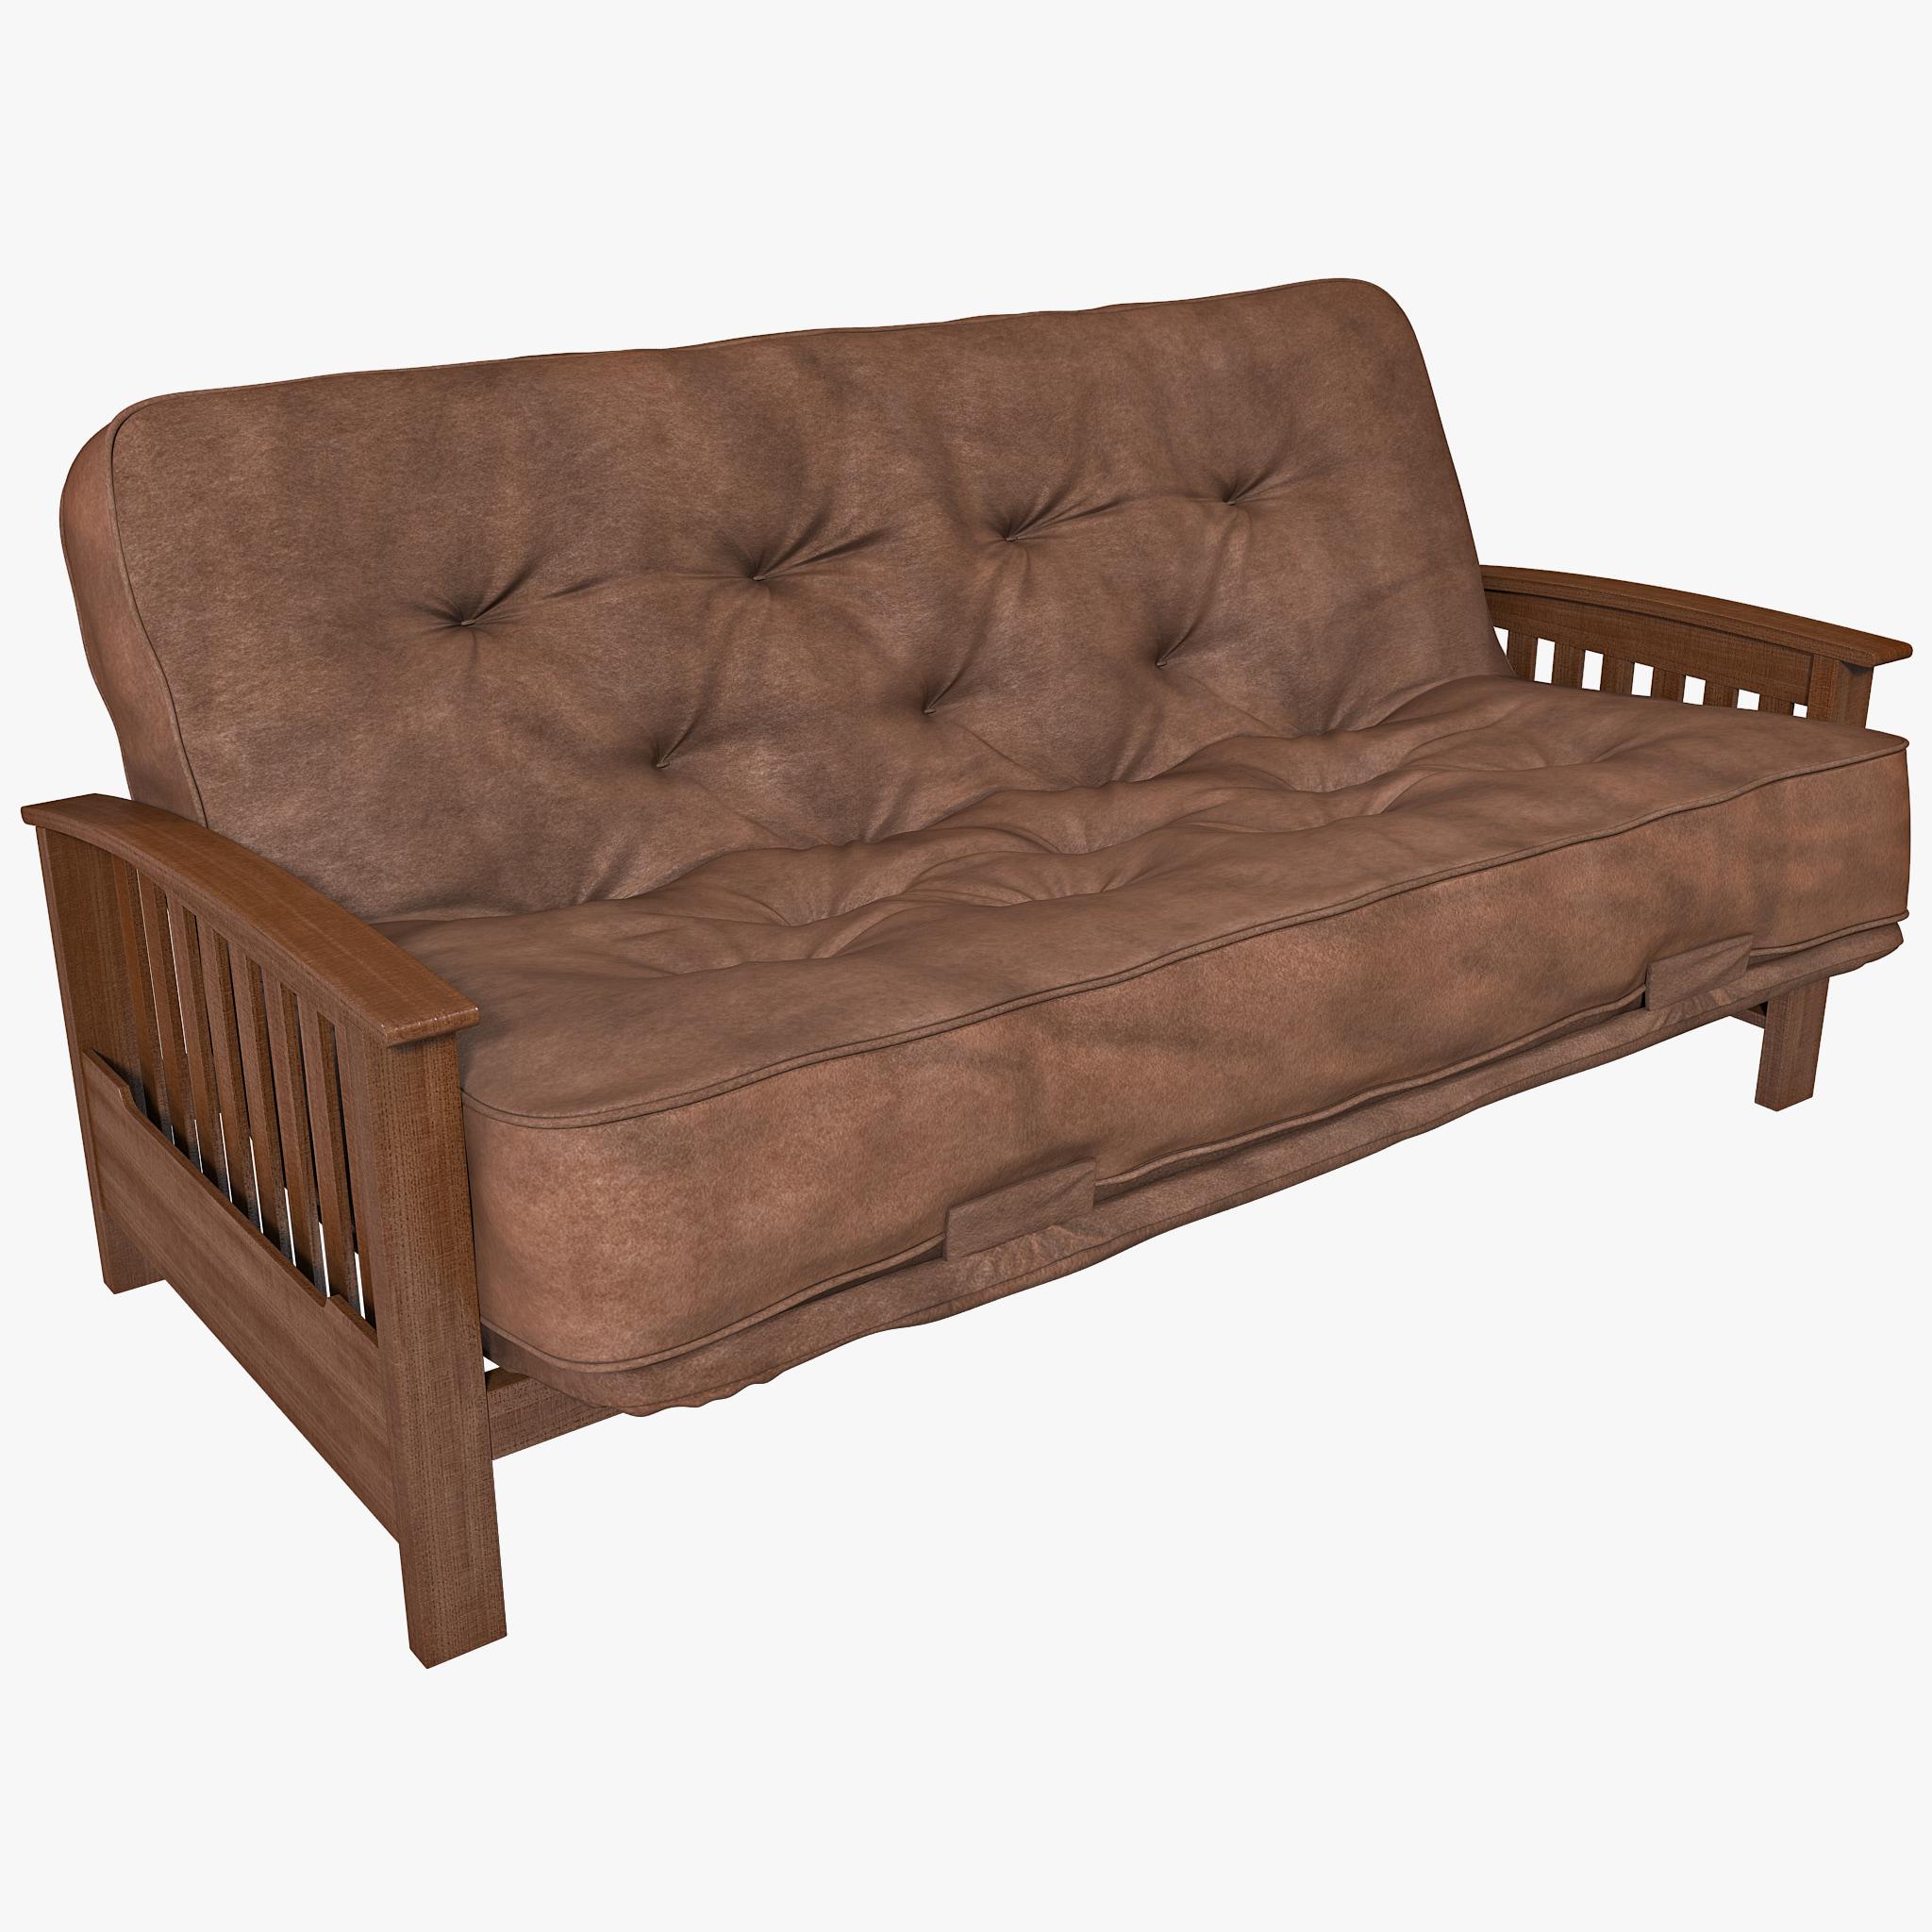 sofa futon 3d model. Black Bedroom Furniture Sets. Home Design Ideas